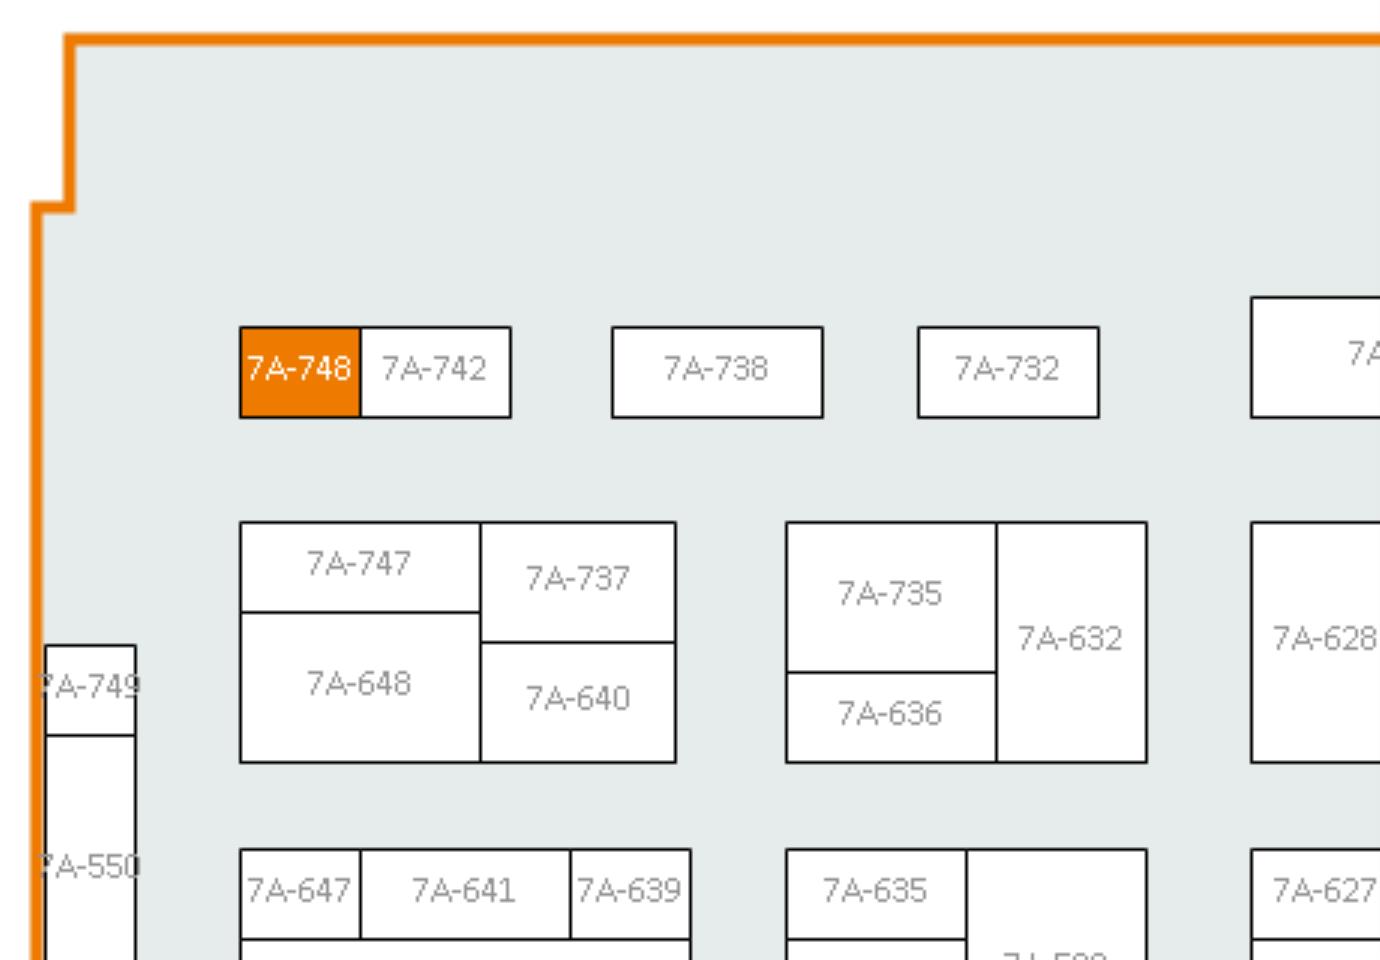 7A / 7A-748